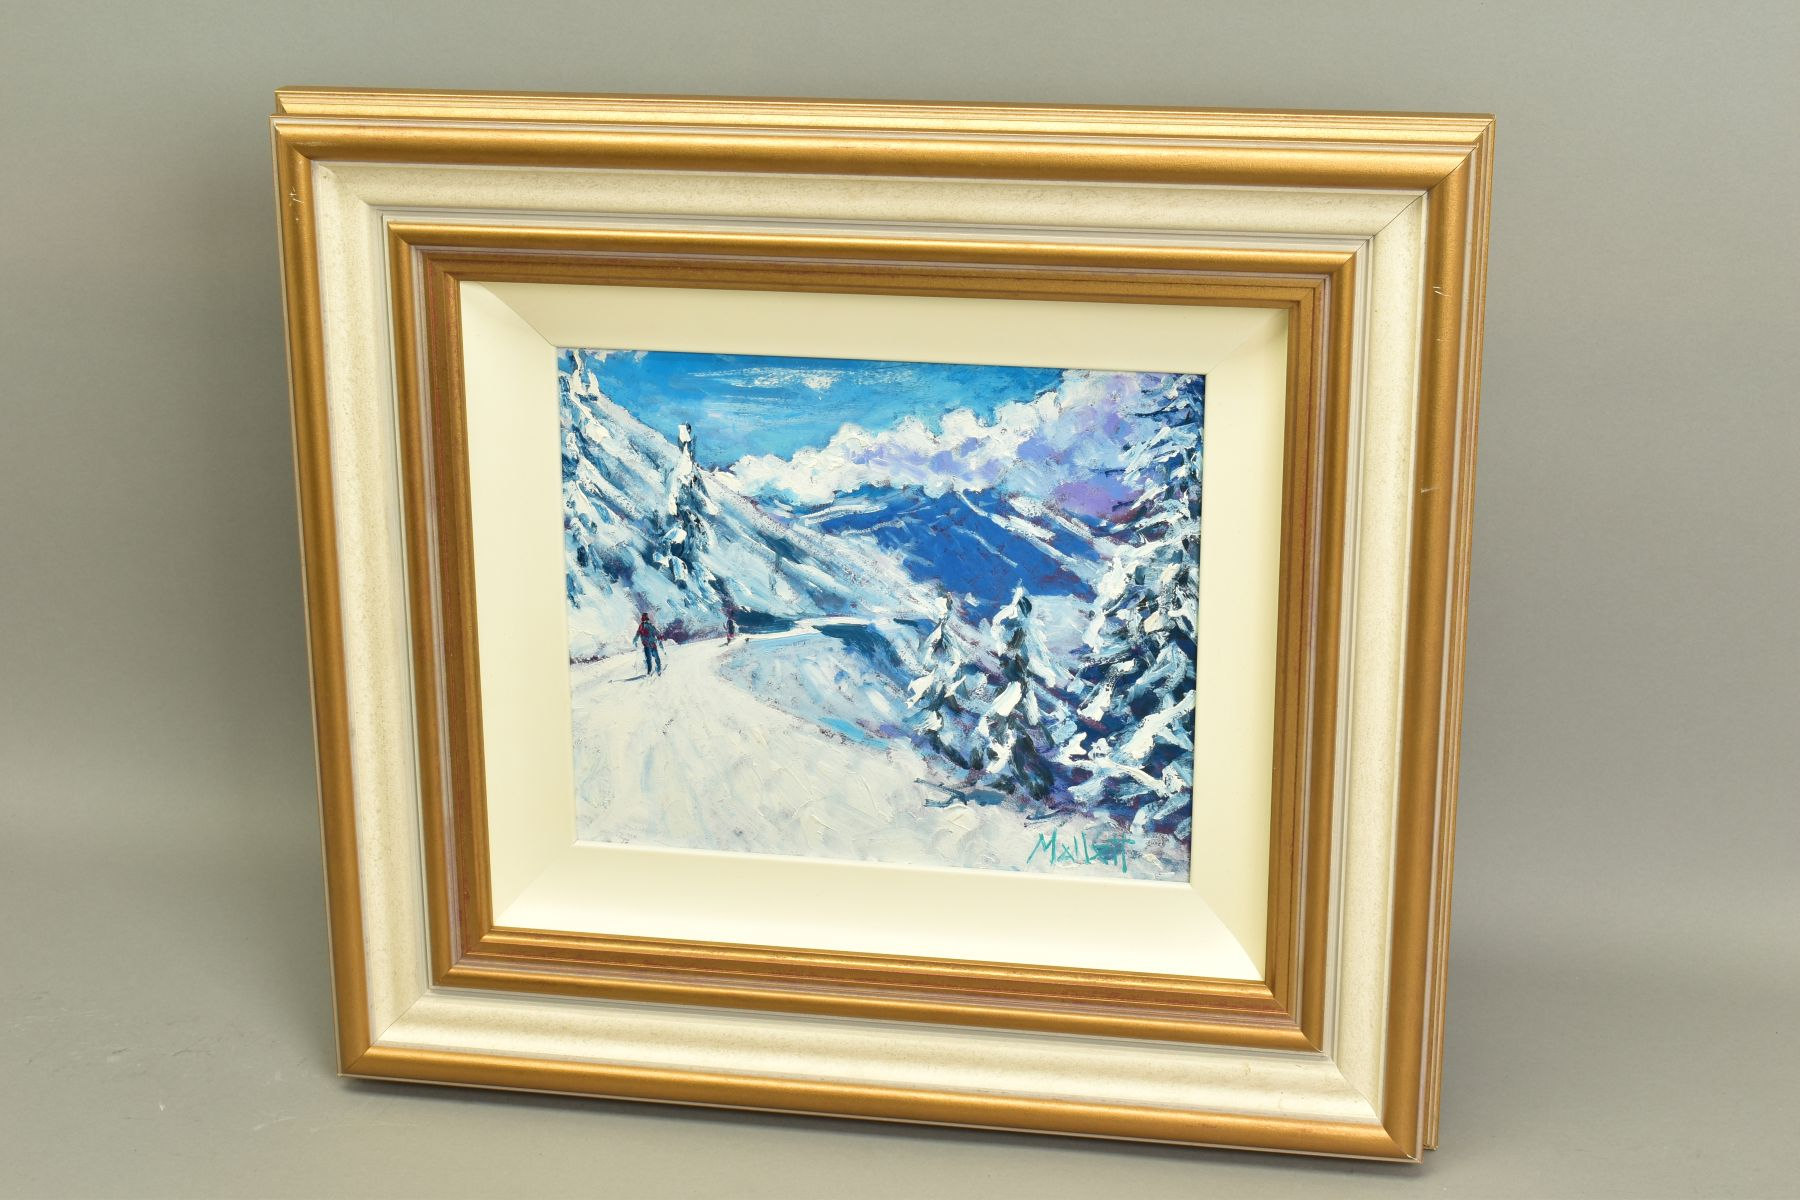 TIMMY MALLETT (BRITISH CONTEMPORARY), 'Winter Fun', an impressionist Alpine scene with skiers, - Image 5 of 7